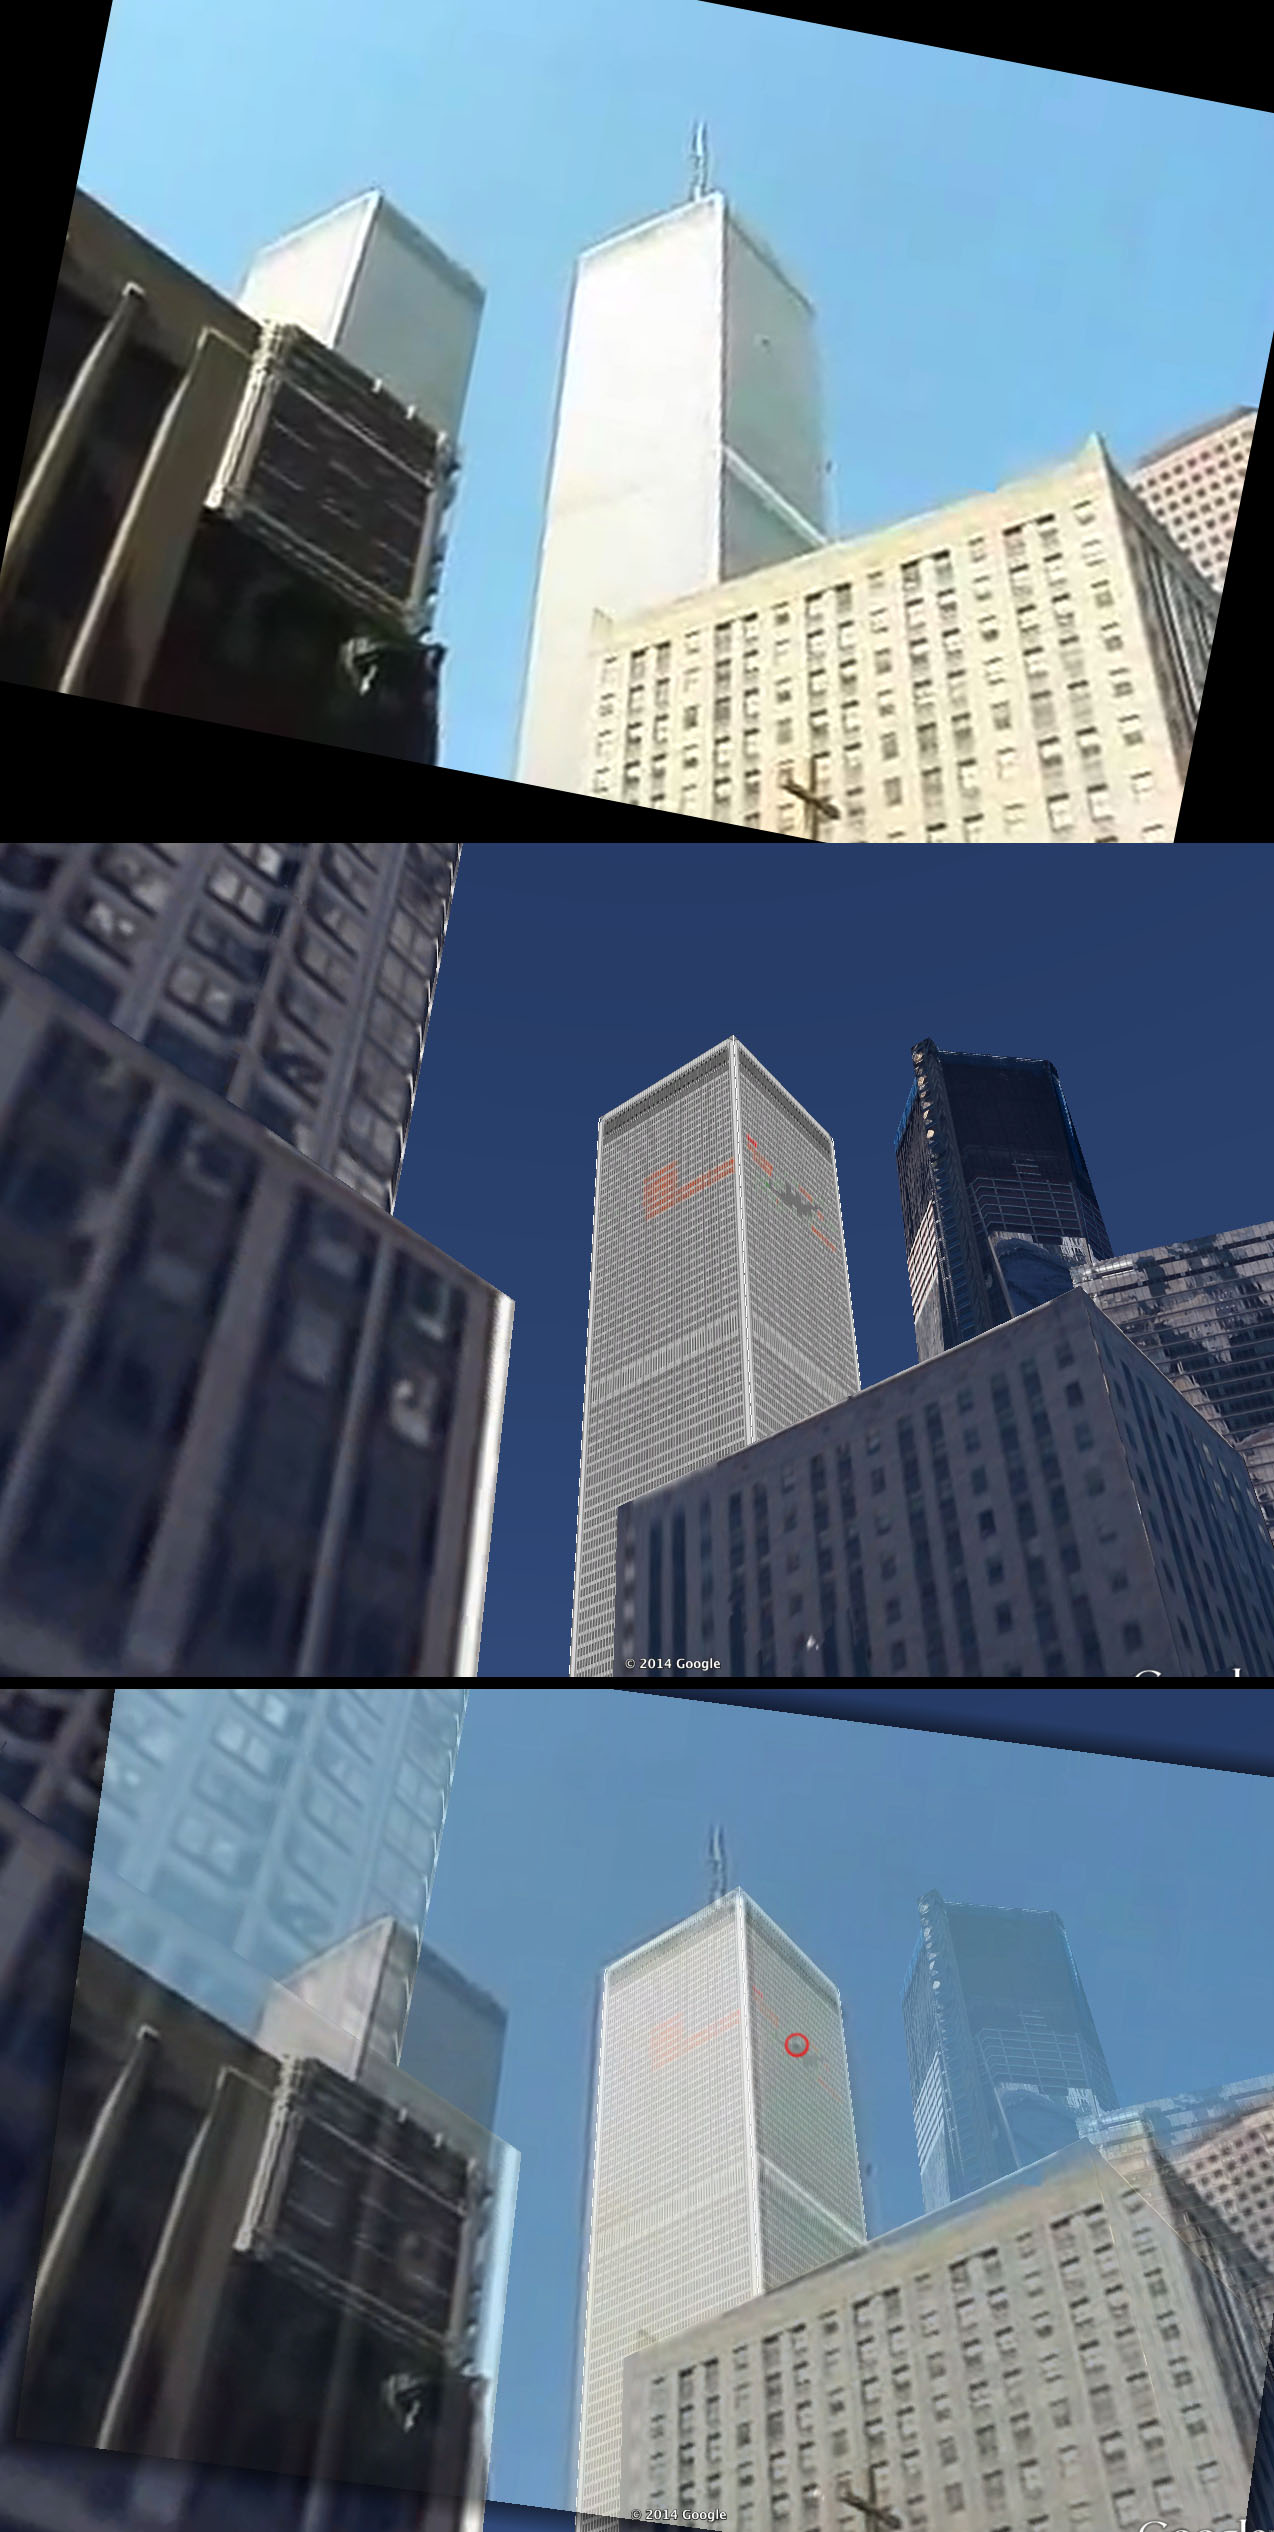 http://911maps.free.fr/ReOpen911/ShadowOnWTC.jpg